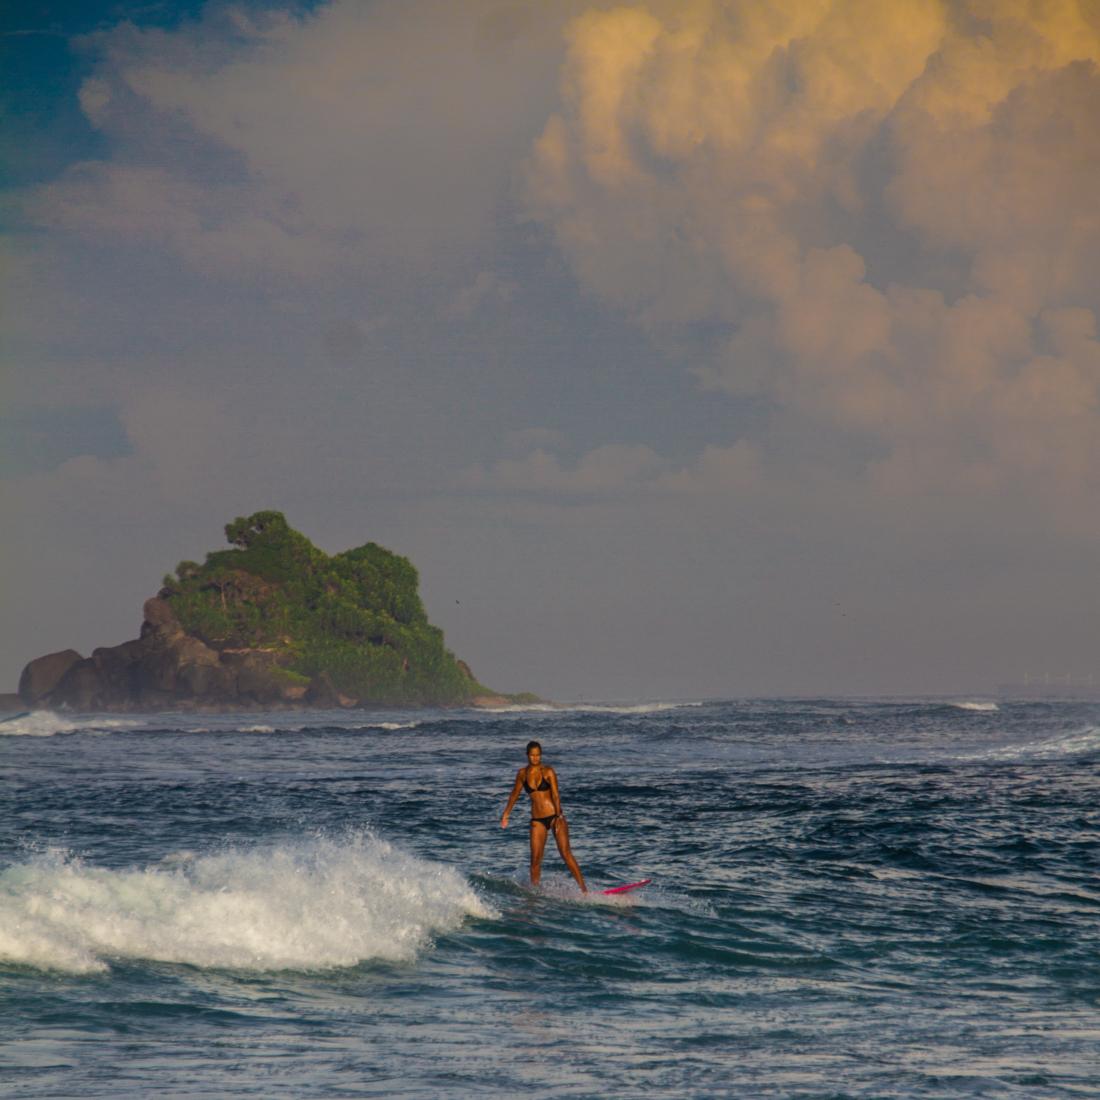 the-sidewalk-secrets-travel-blog-surf-sri-lanka-midigama-mirissa-surfing-sunset-16